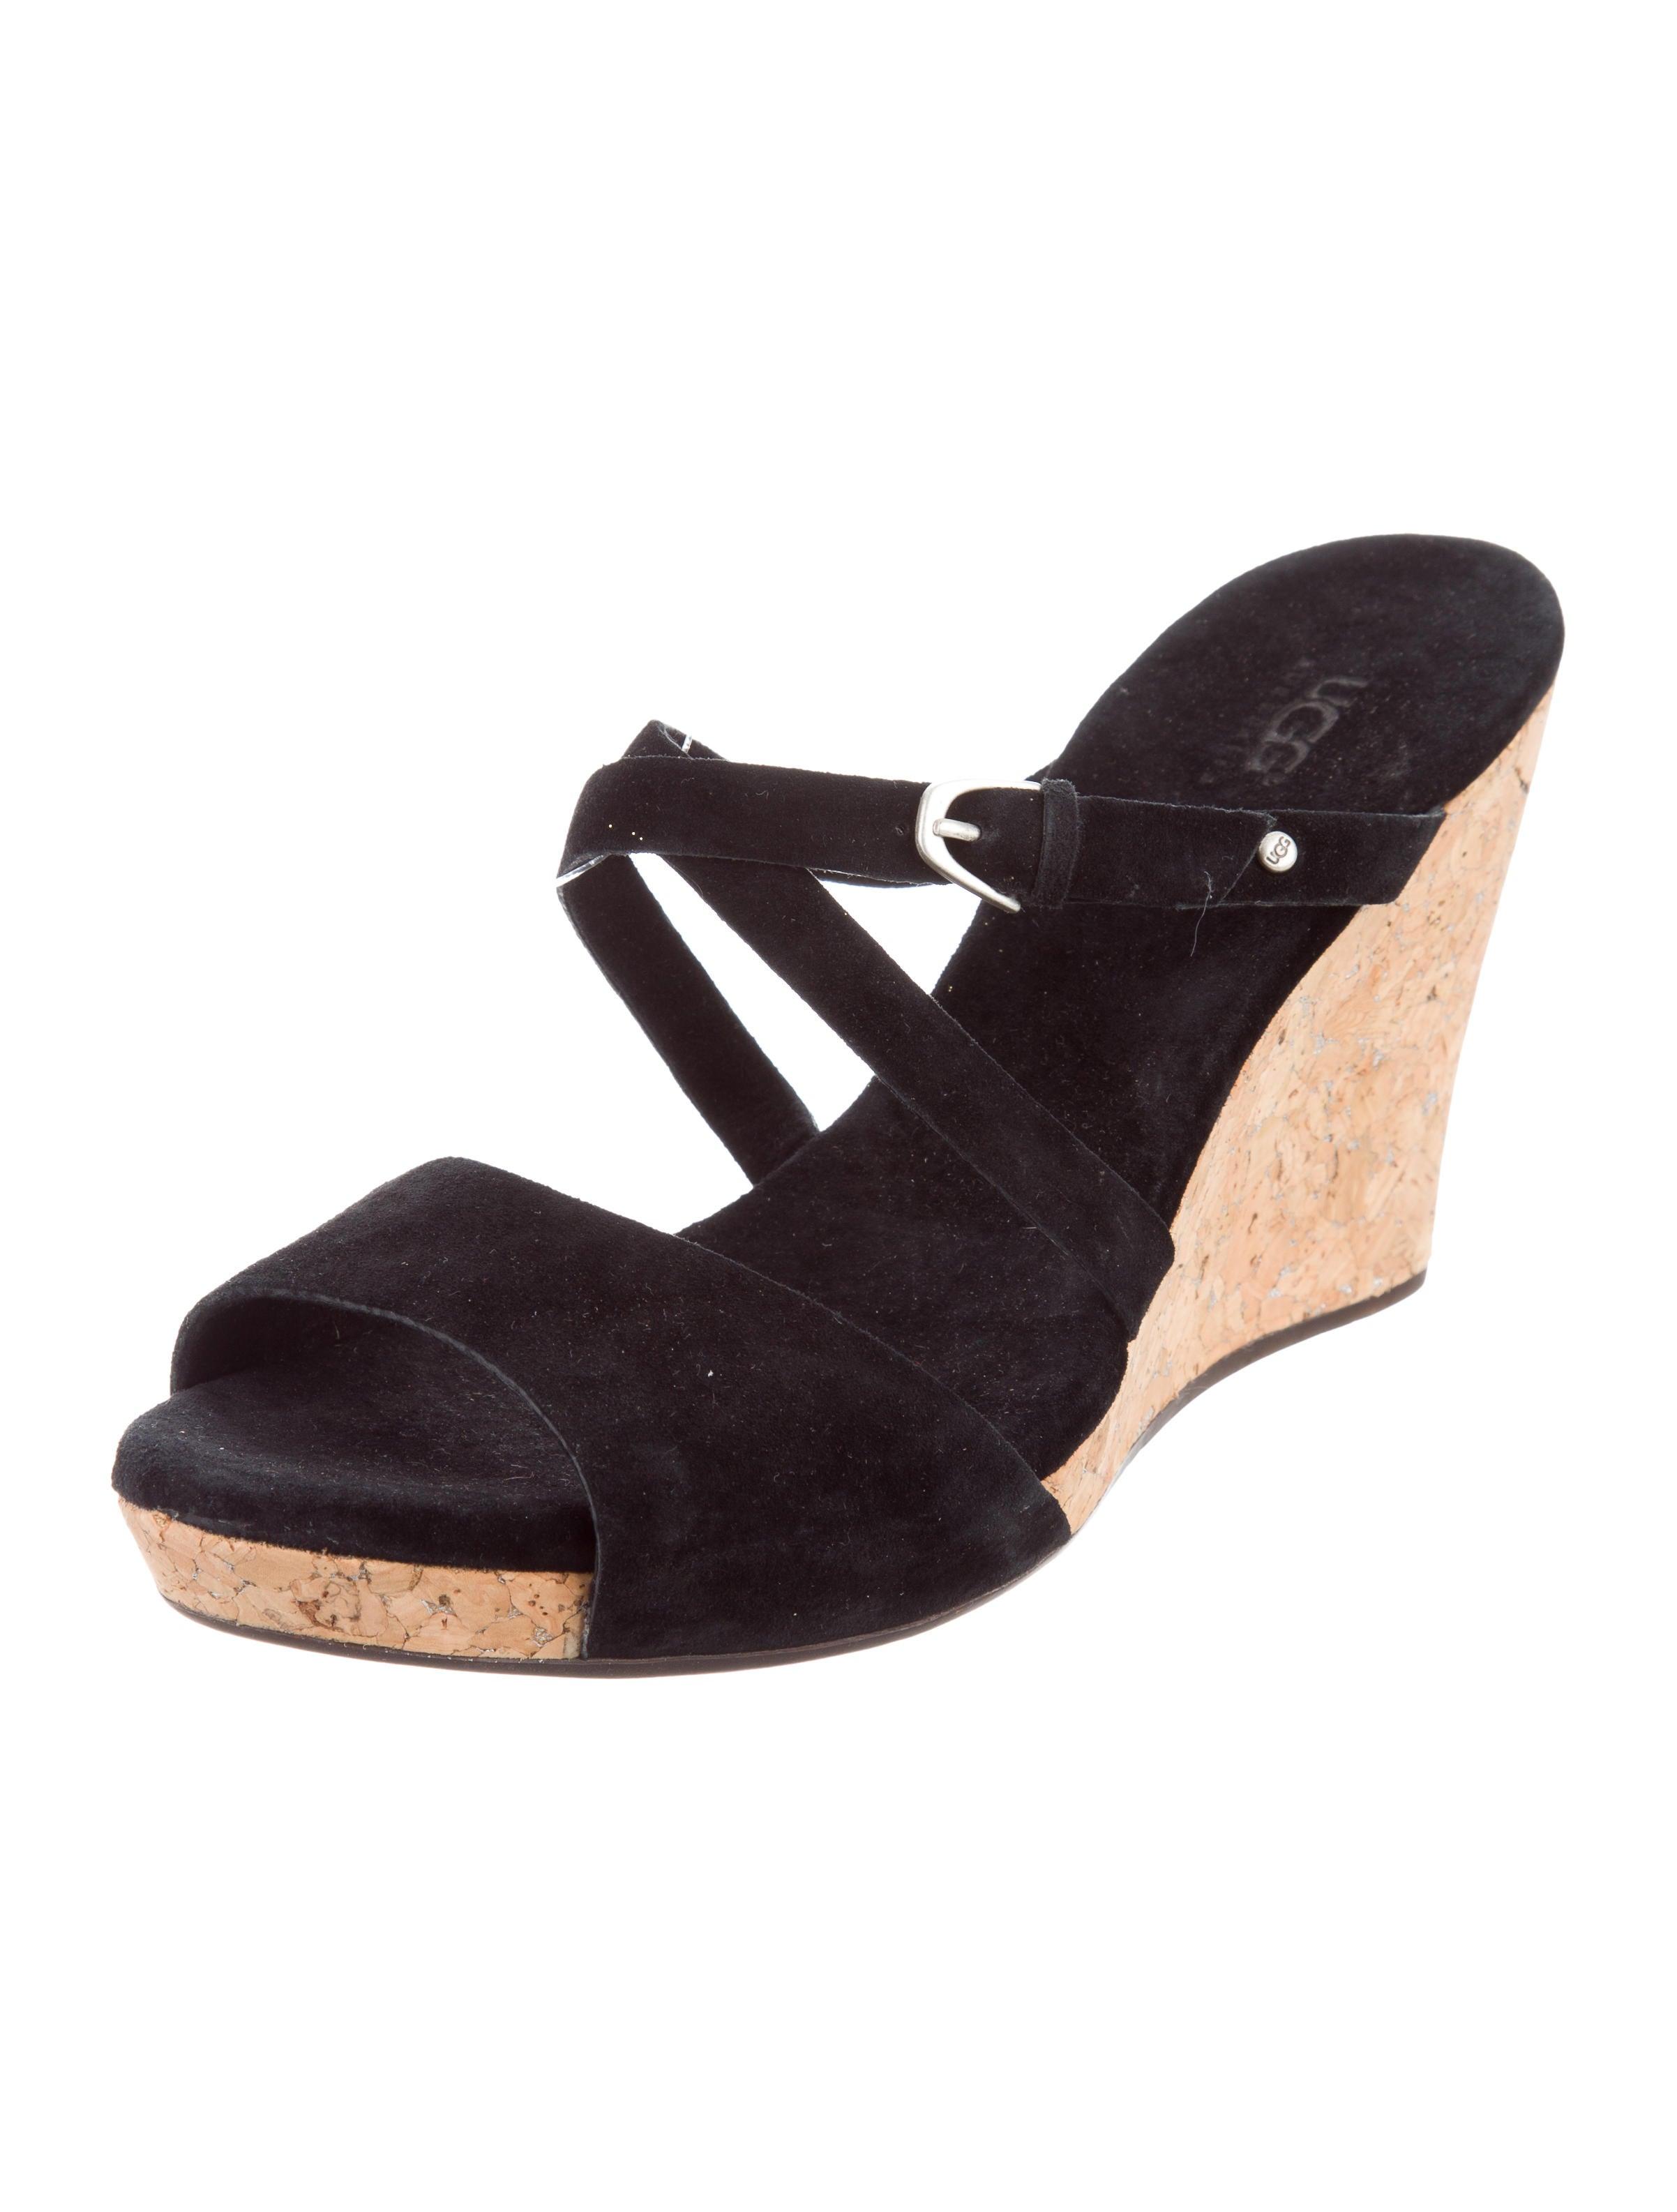 ugg australia suede platform wedges shoes wuugg20968